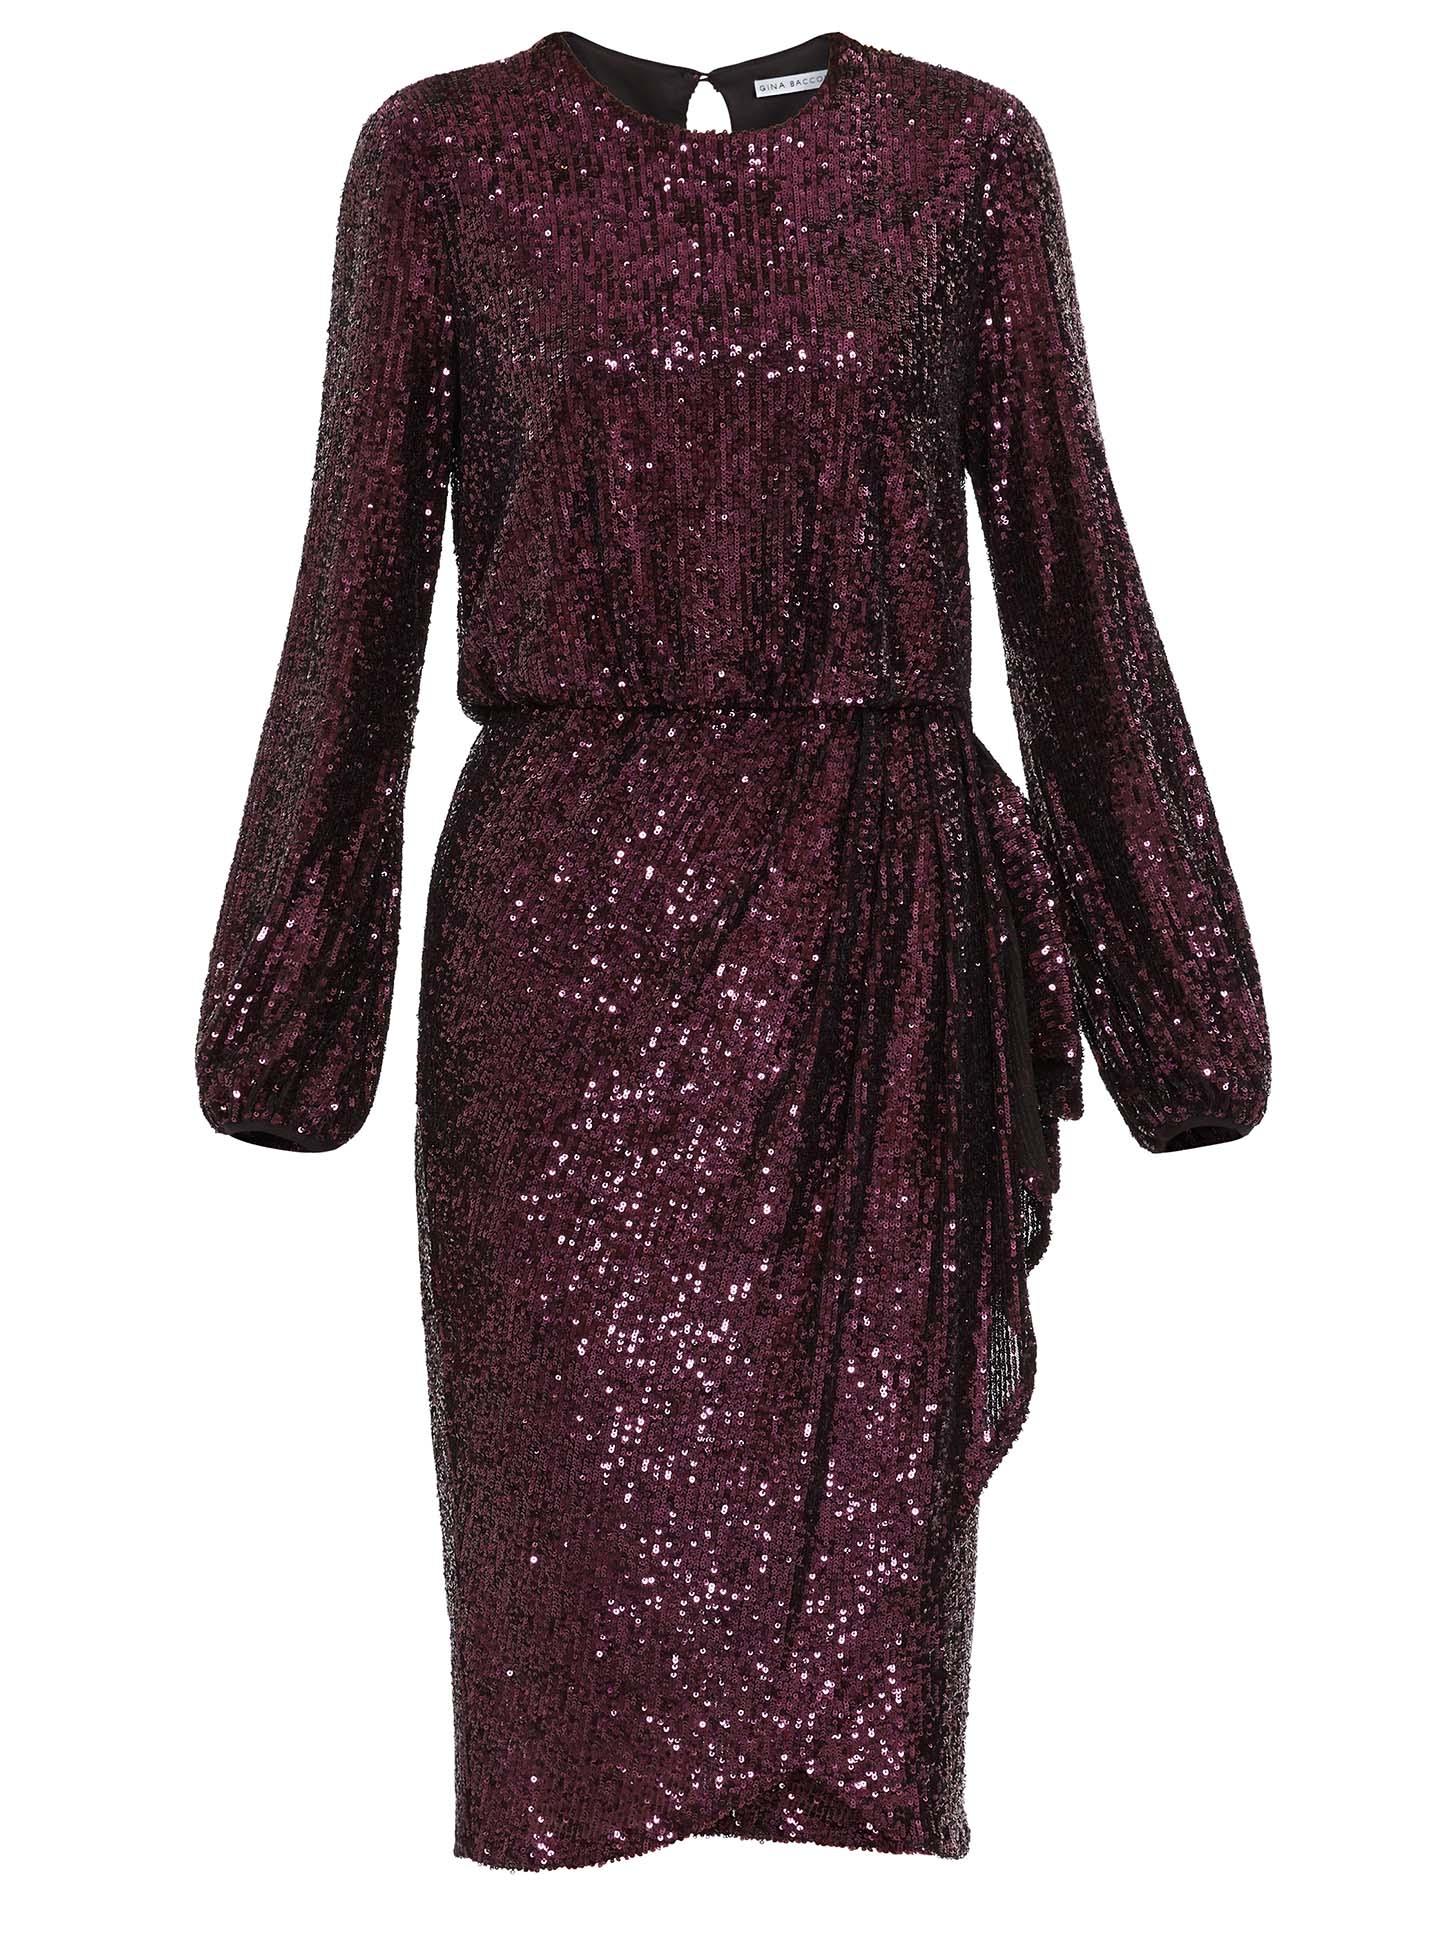 Pieta Sequin Dress